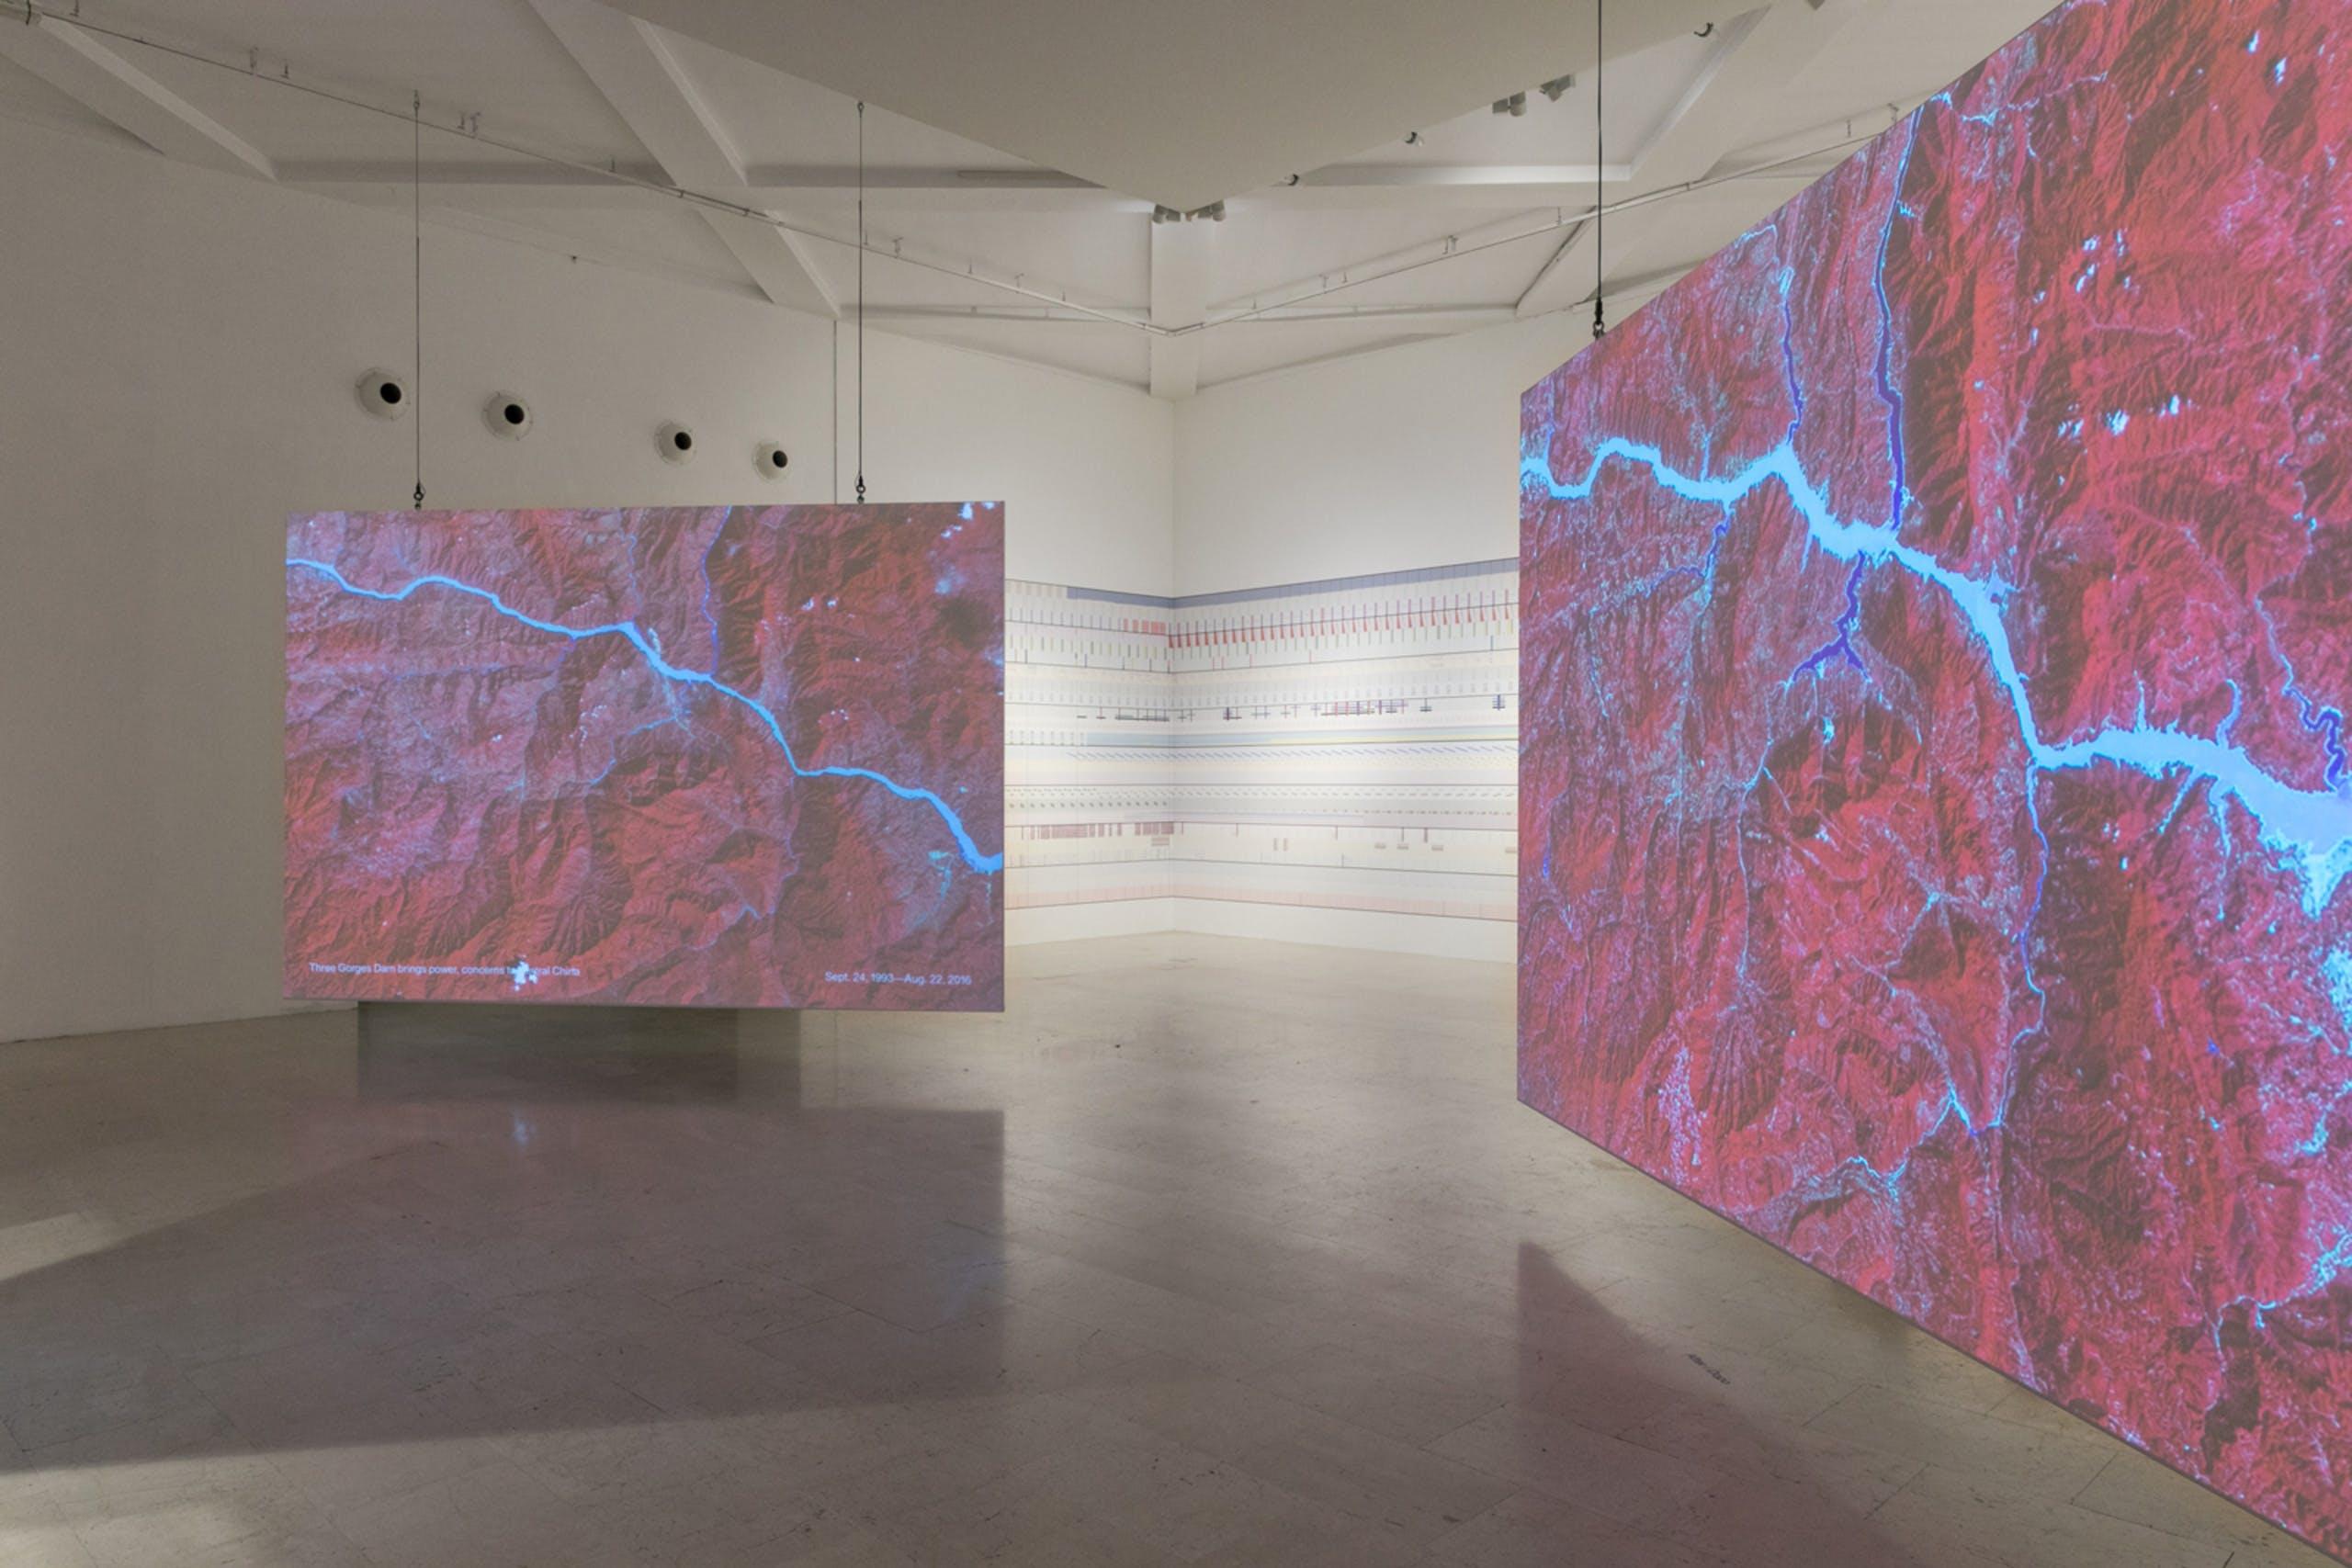 Xxii International Exhibition Of Triennale Milano